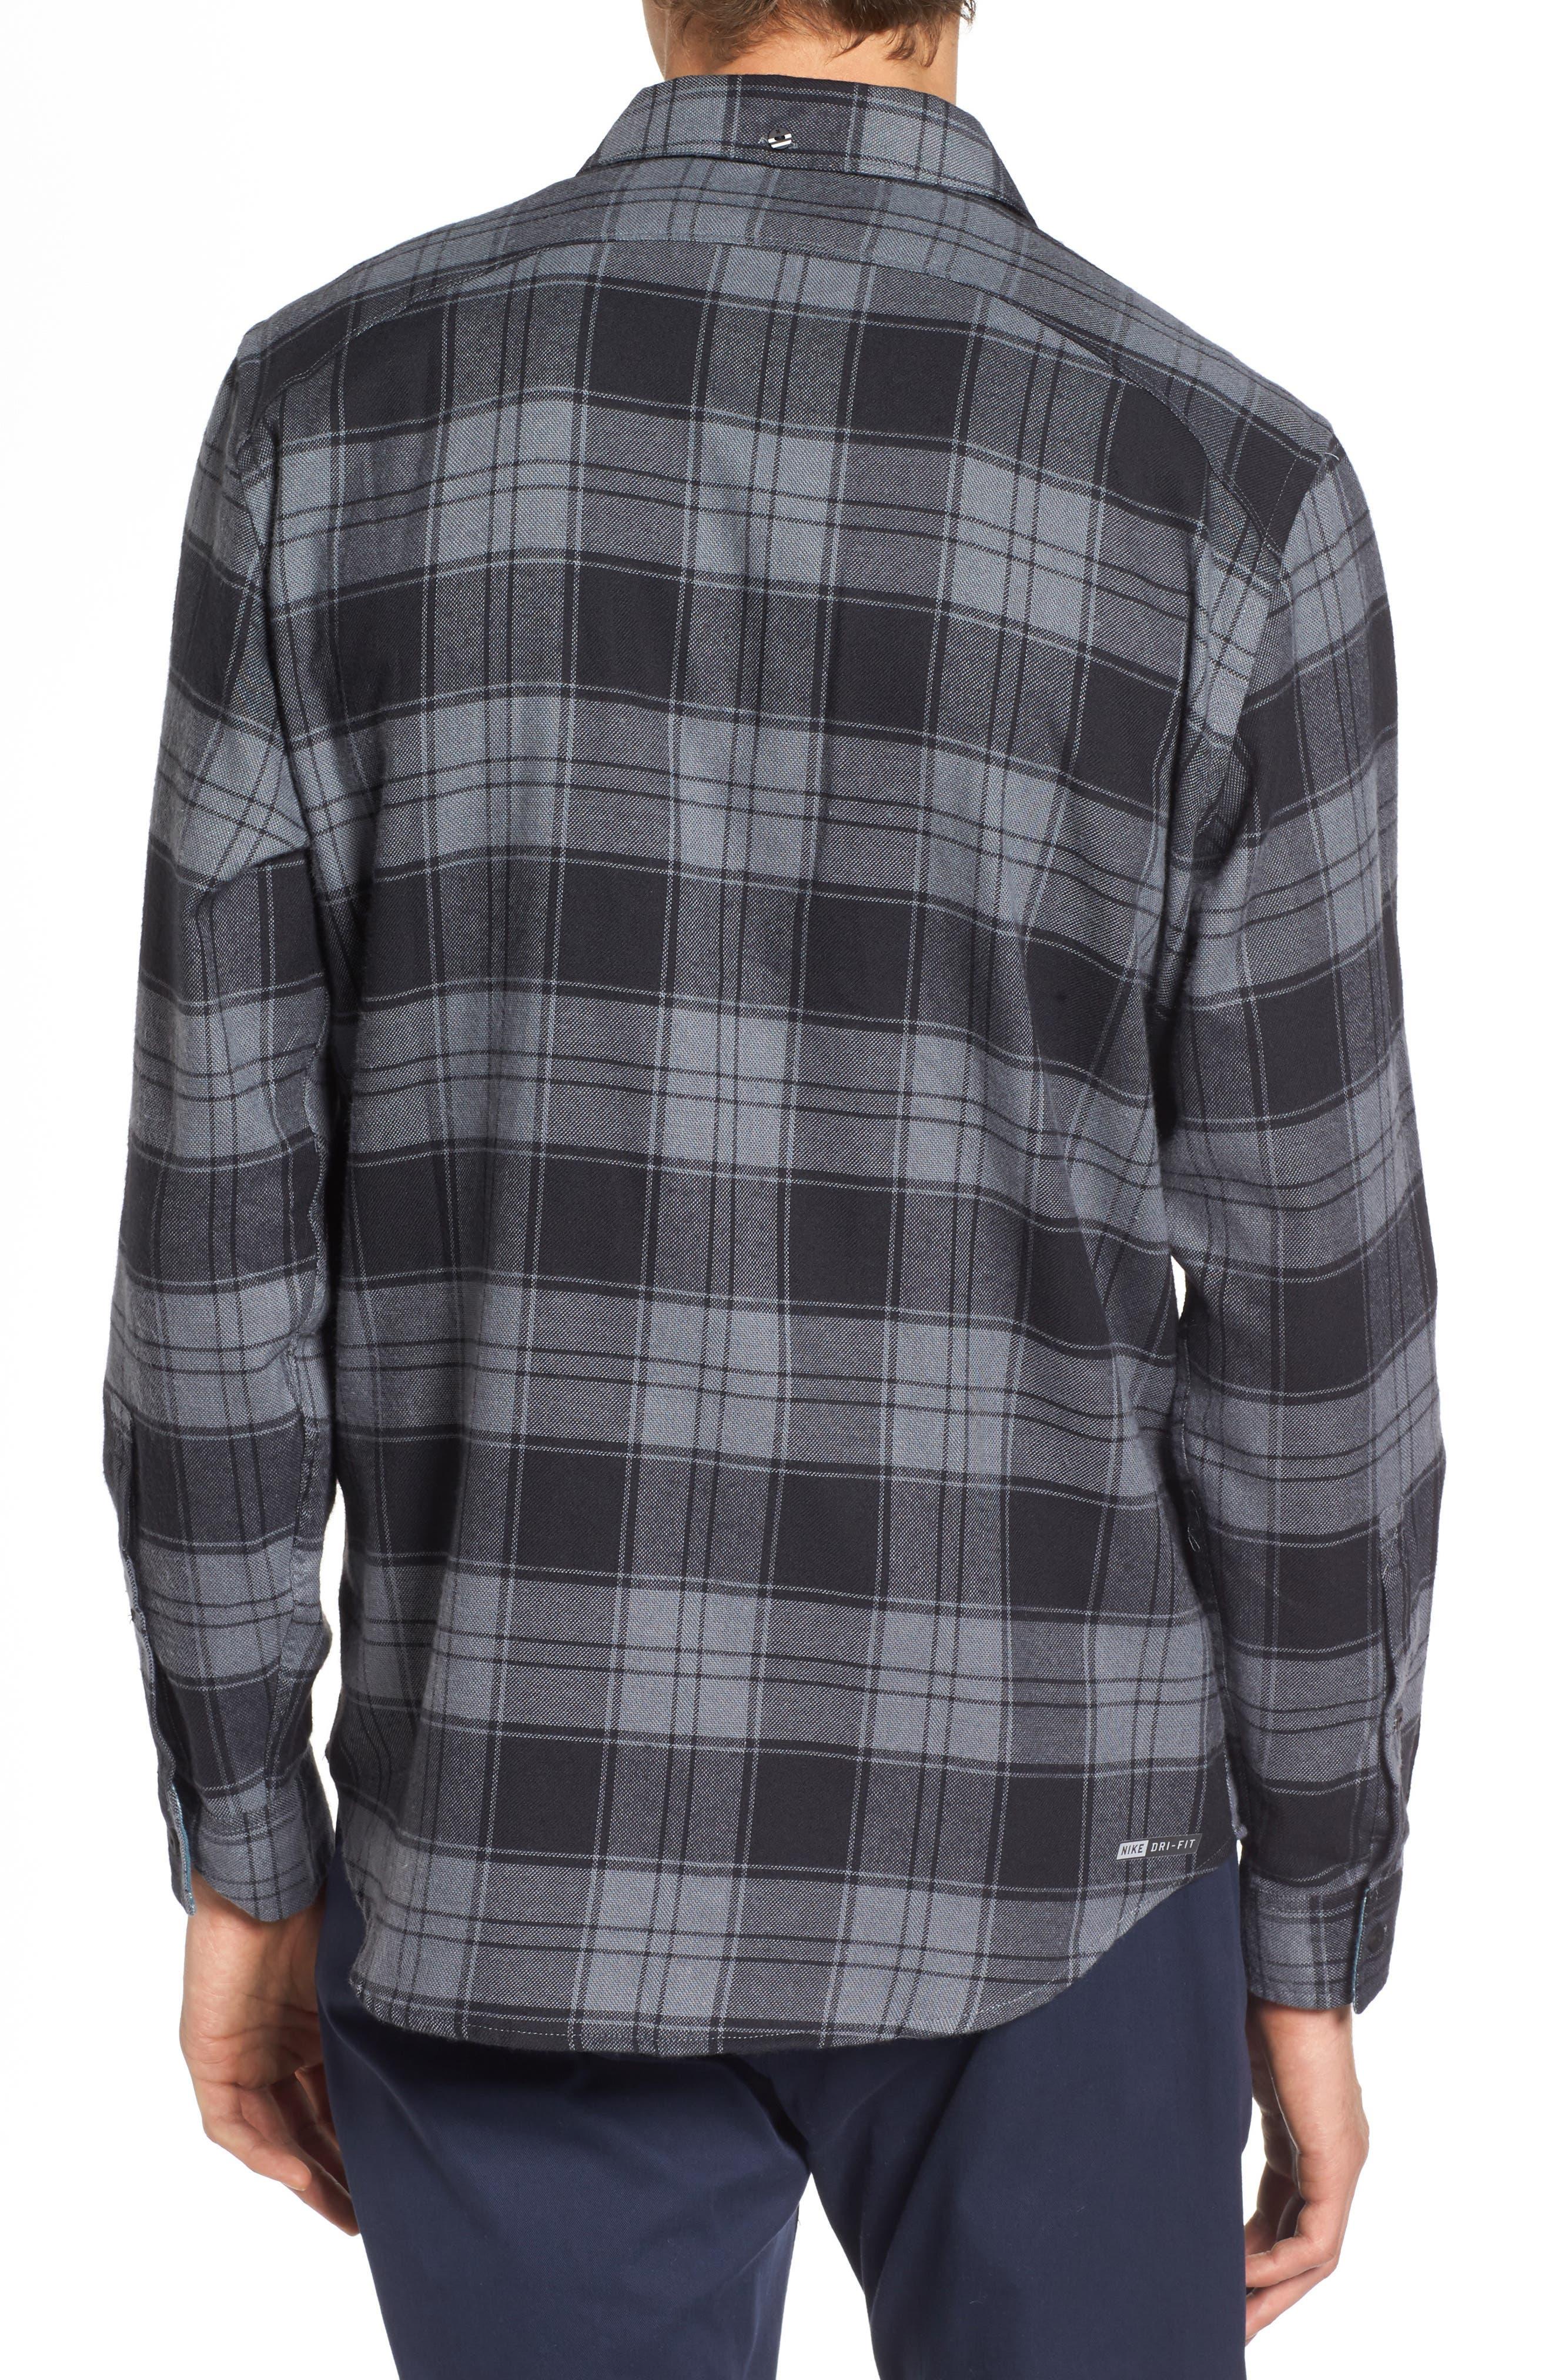 Alternate Image 2  - Hurley Check Dri-FIT Shirt